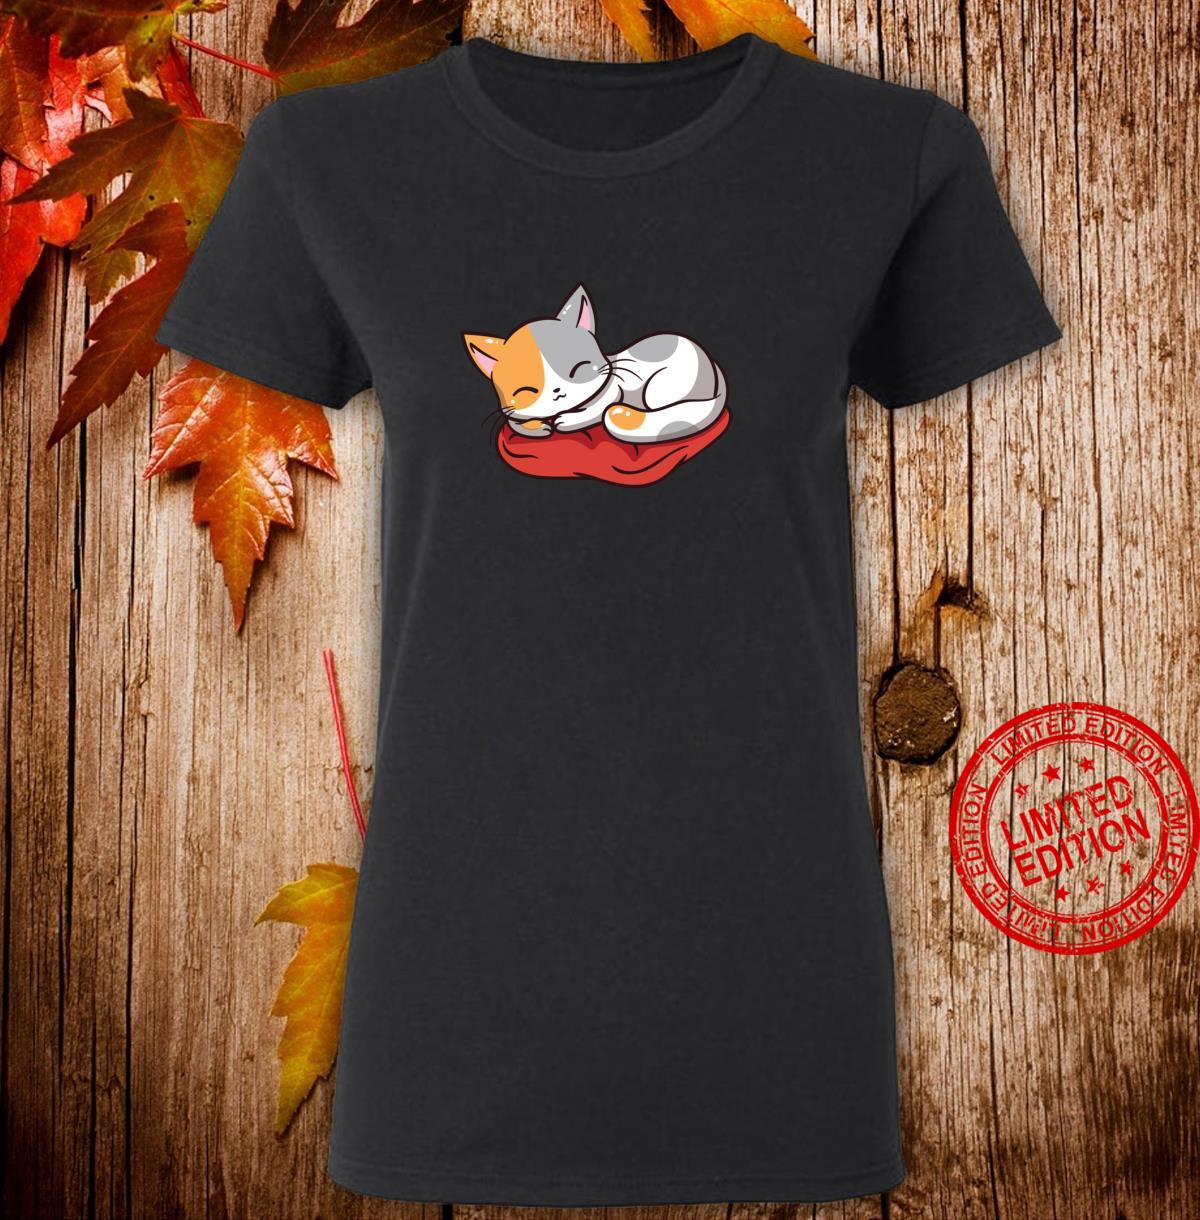 Kawaii süße japanische Anime Katze Neko Girl Langarmshirt Shirt ladies tee